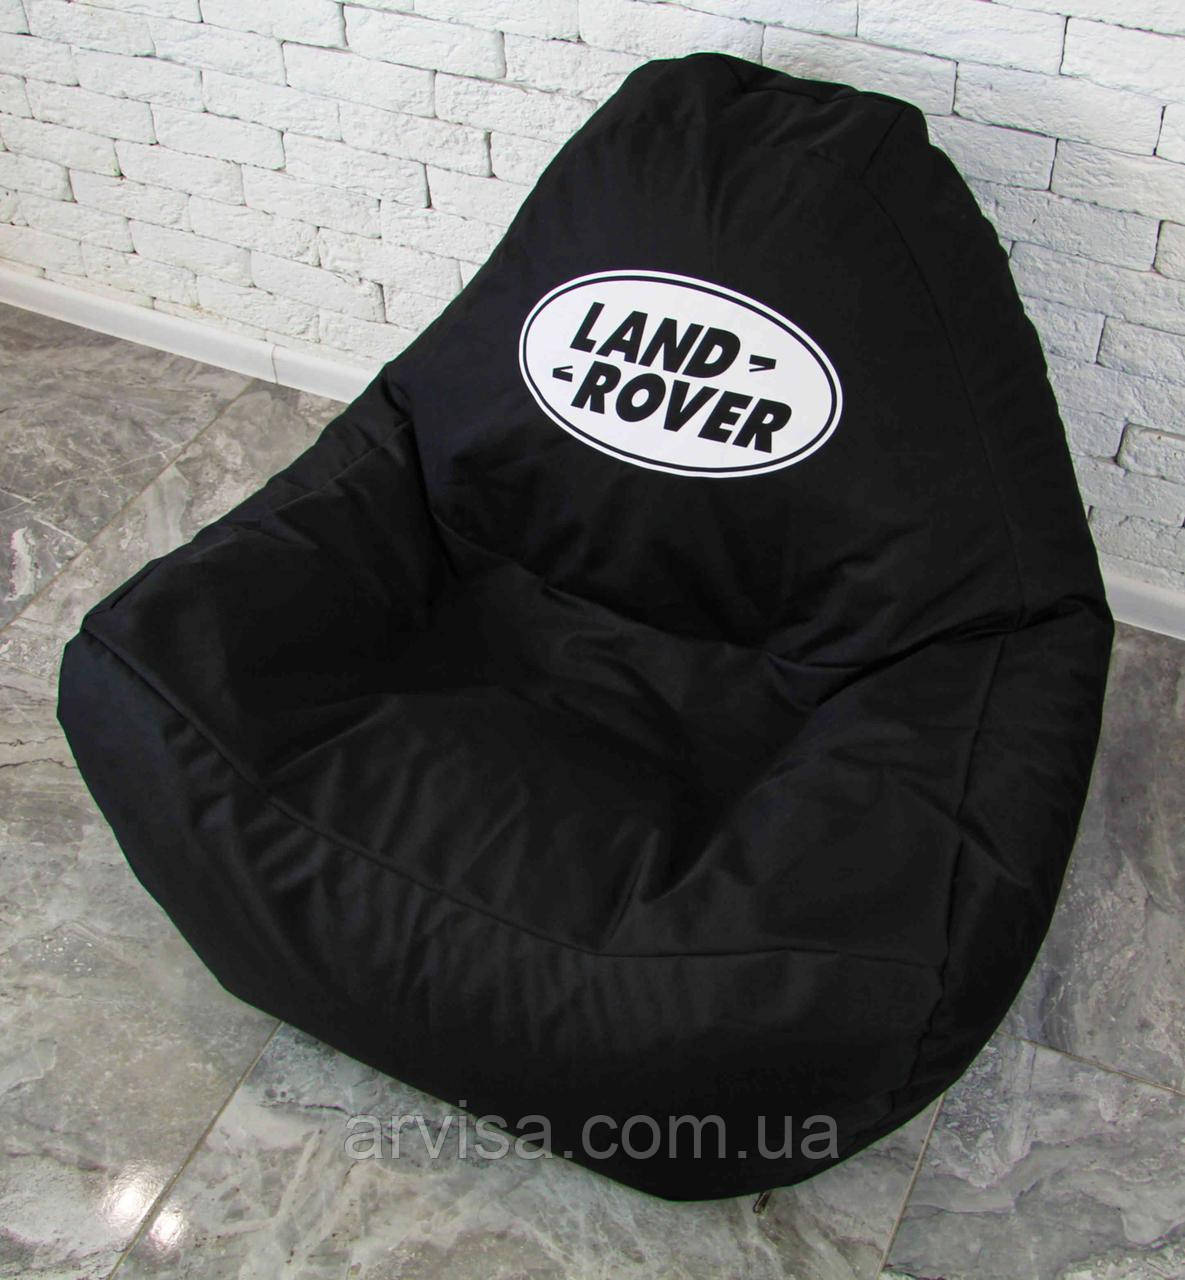 Бескаркасное кресло мешок диван ланд ровер Land rover